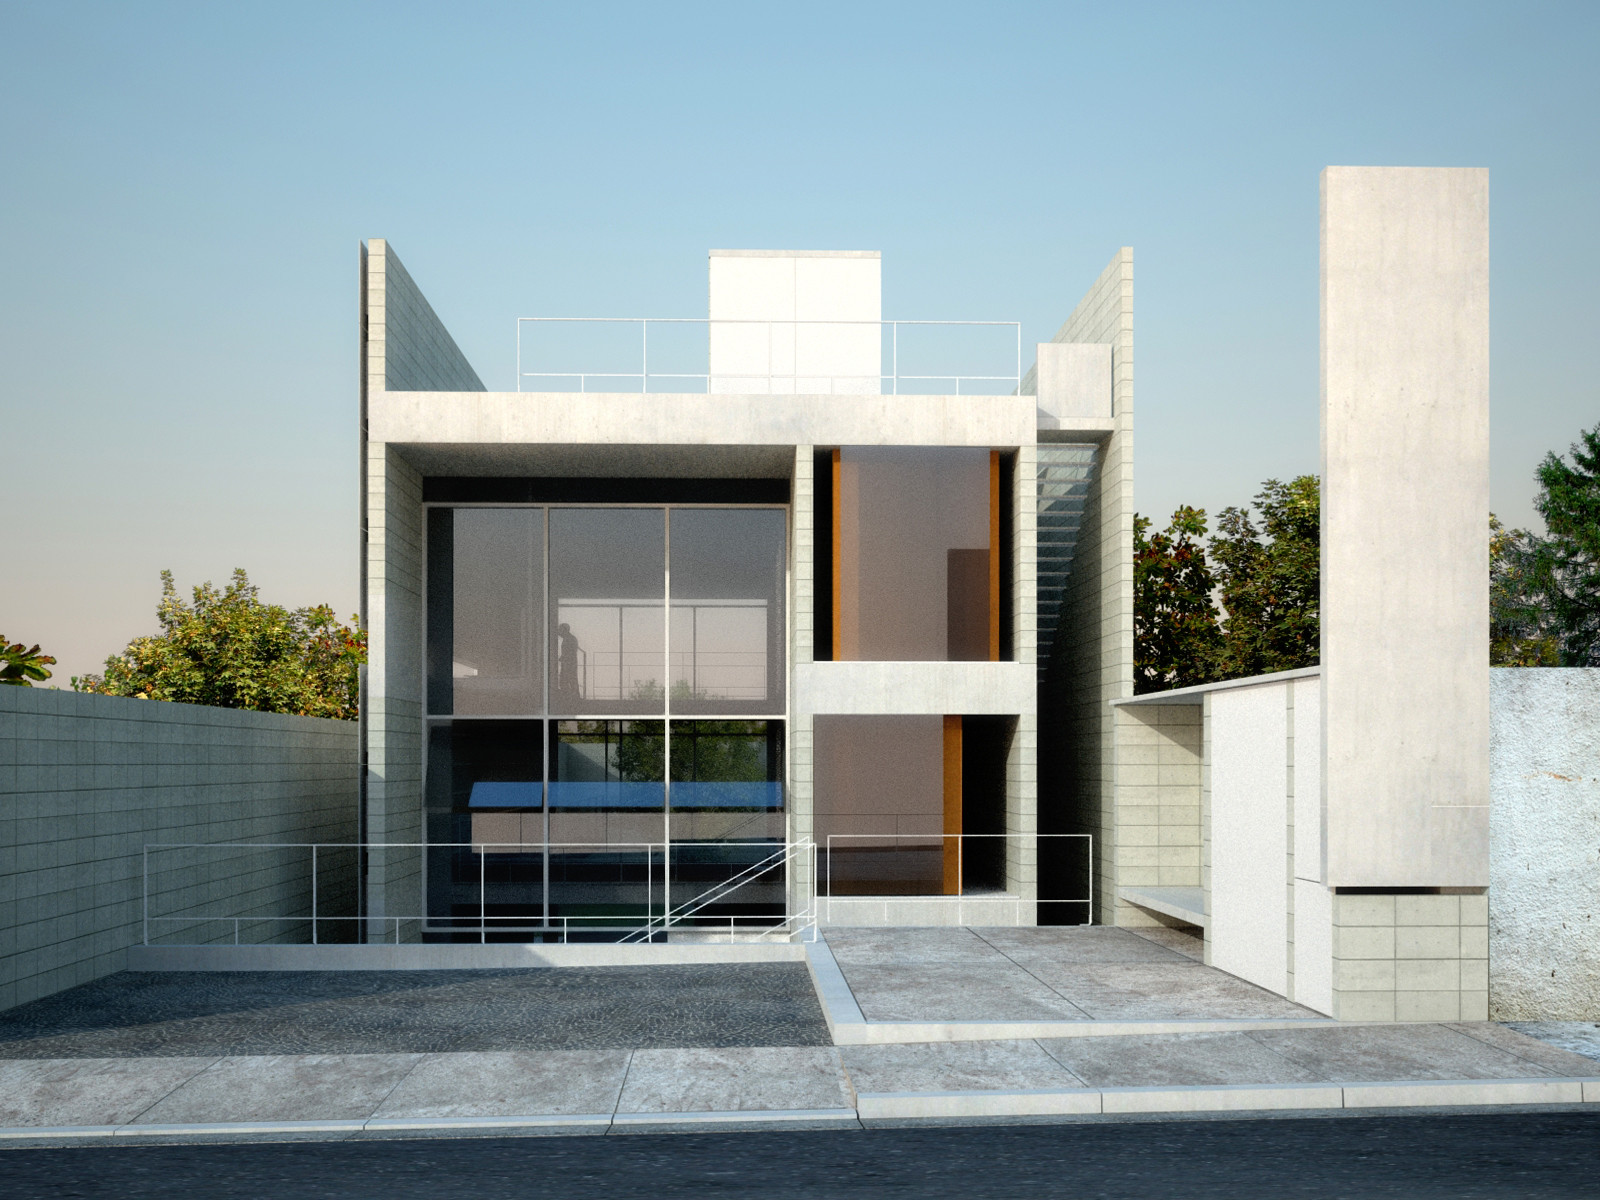 House In Sao Paulo / GrupoSP, © Nelson Kon